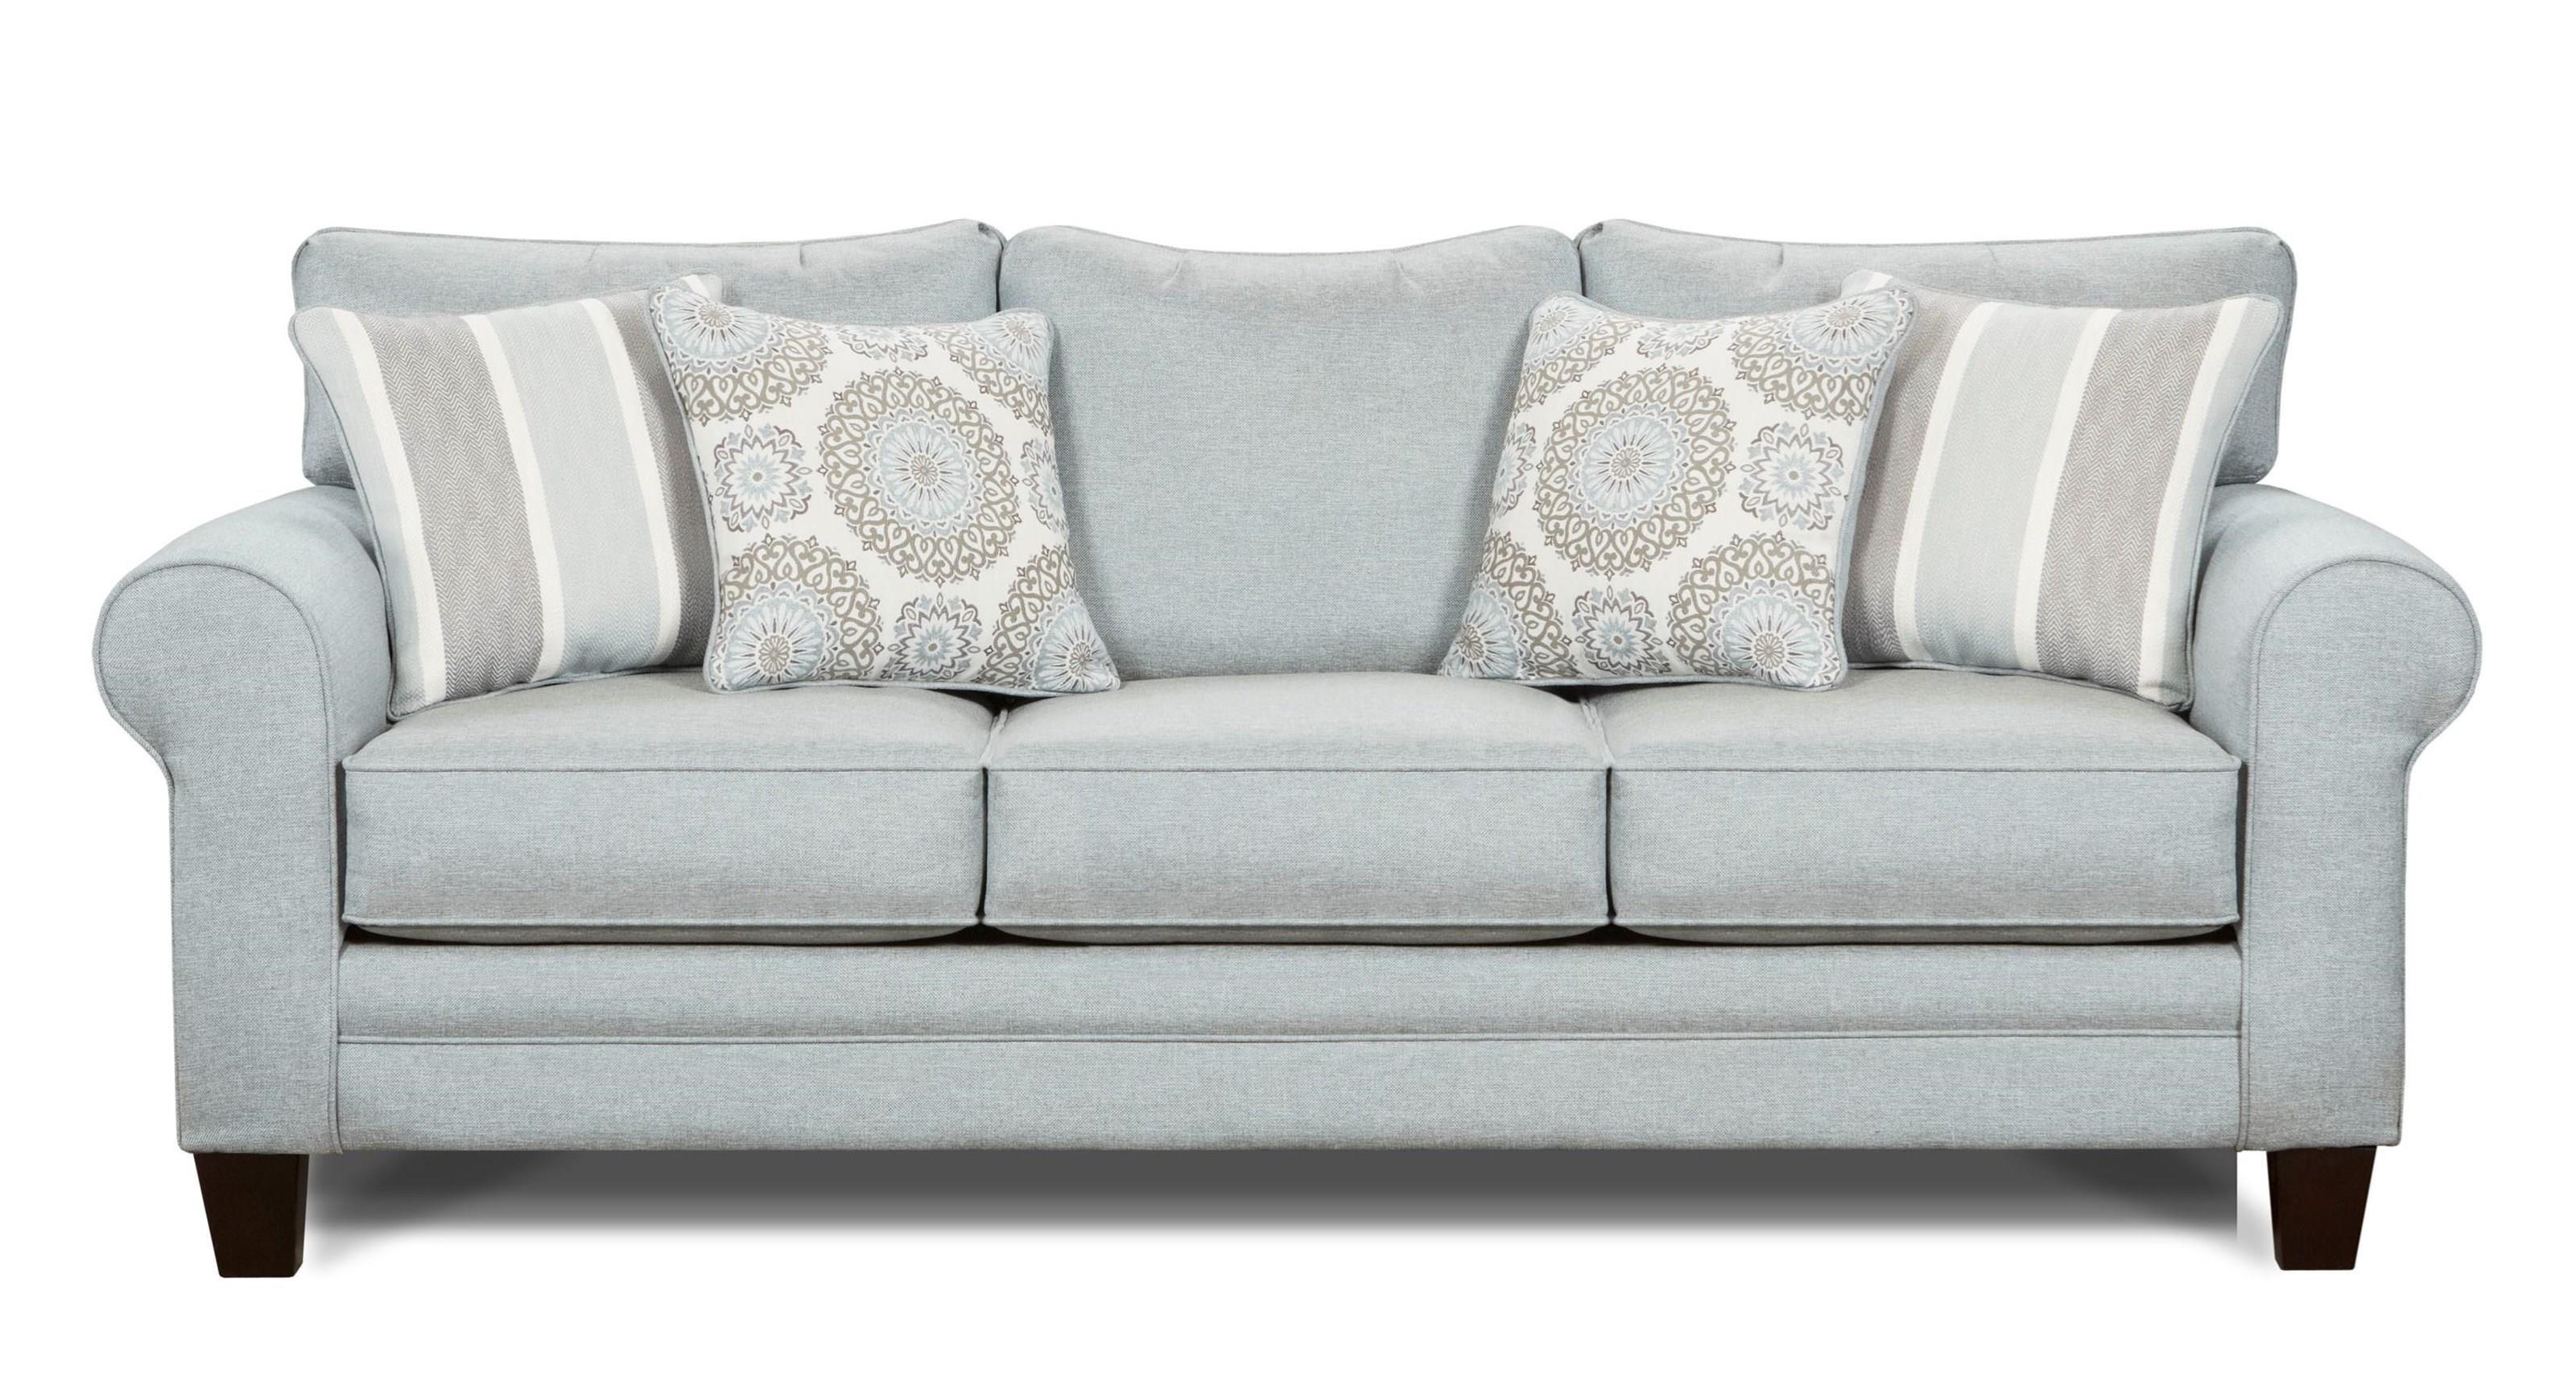 Delicieux Fusion Furniture Grande MistSleeper Sofa ...